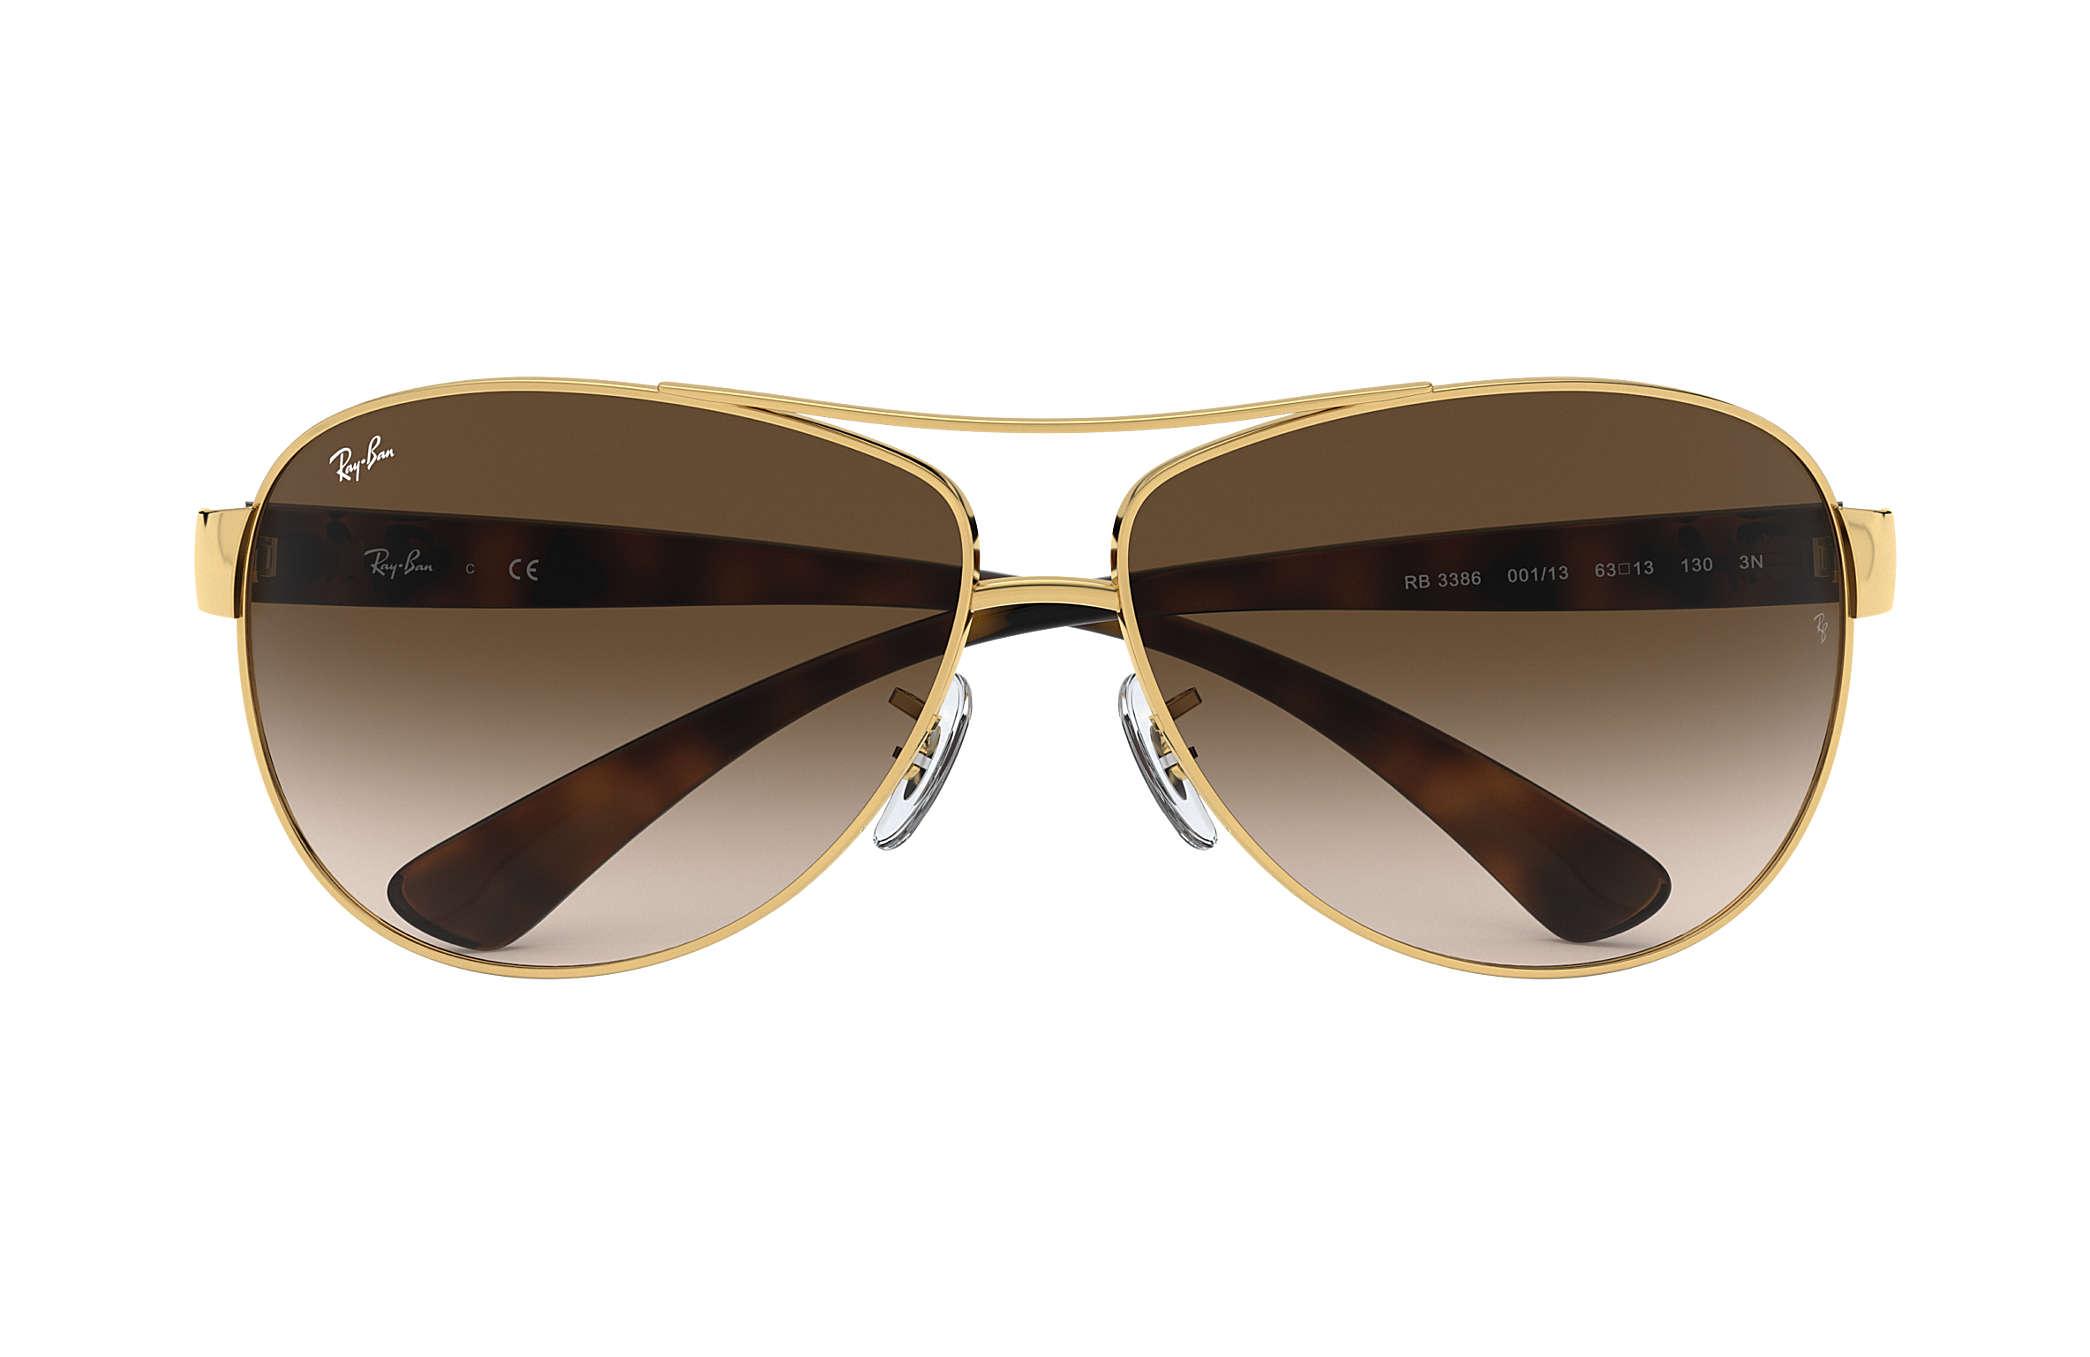 ray ban gold  Ray-Ban RB3386 Gold Tortoise, Brown Lenses